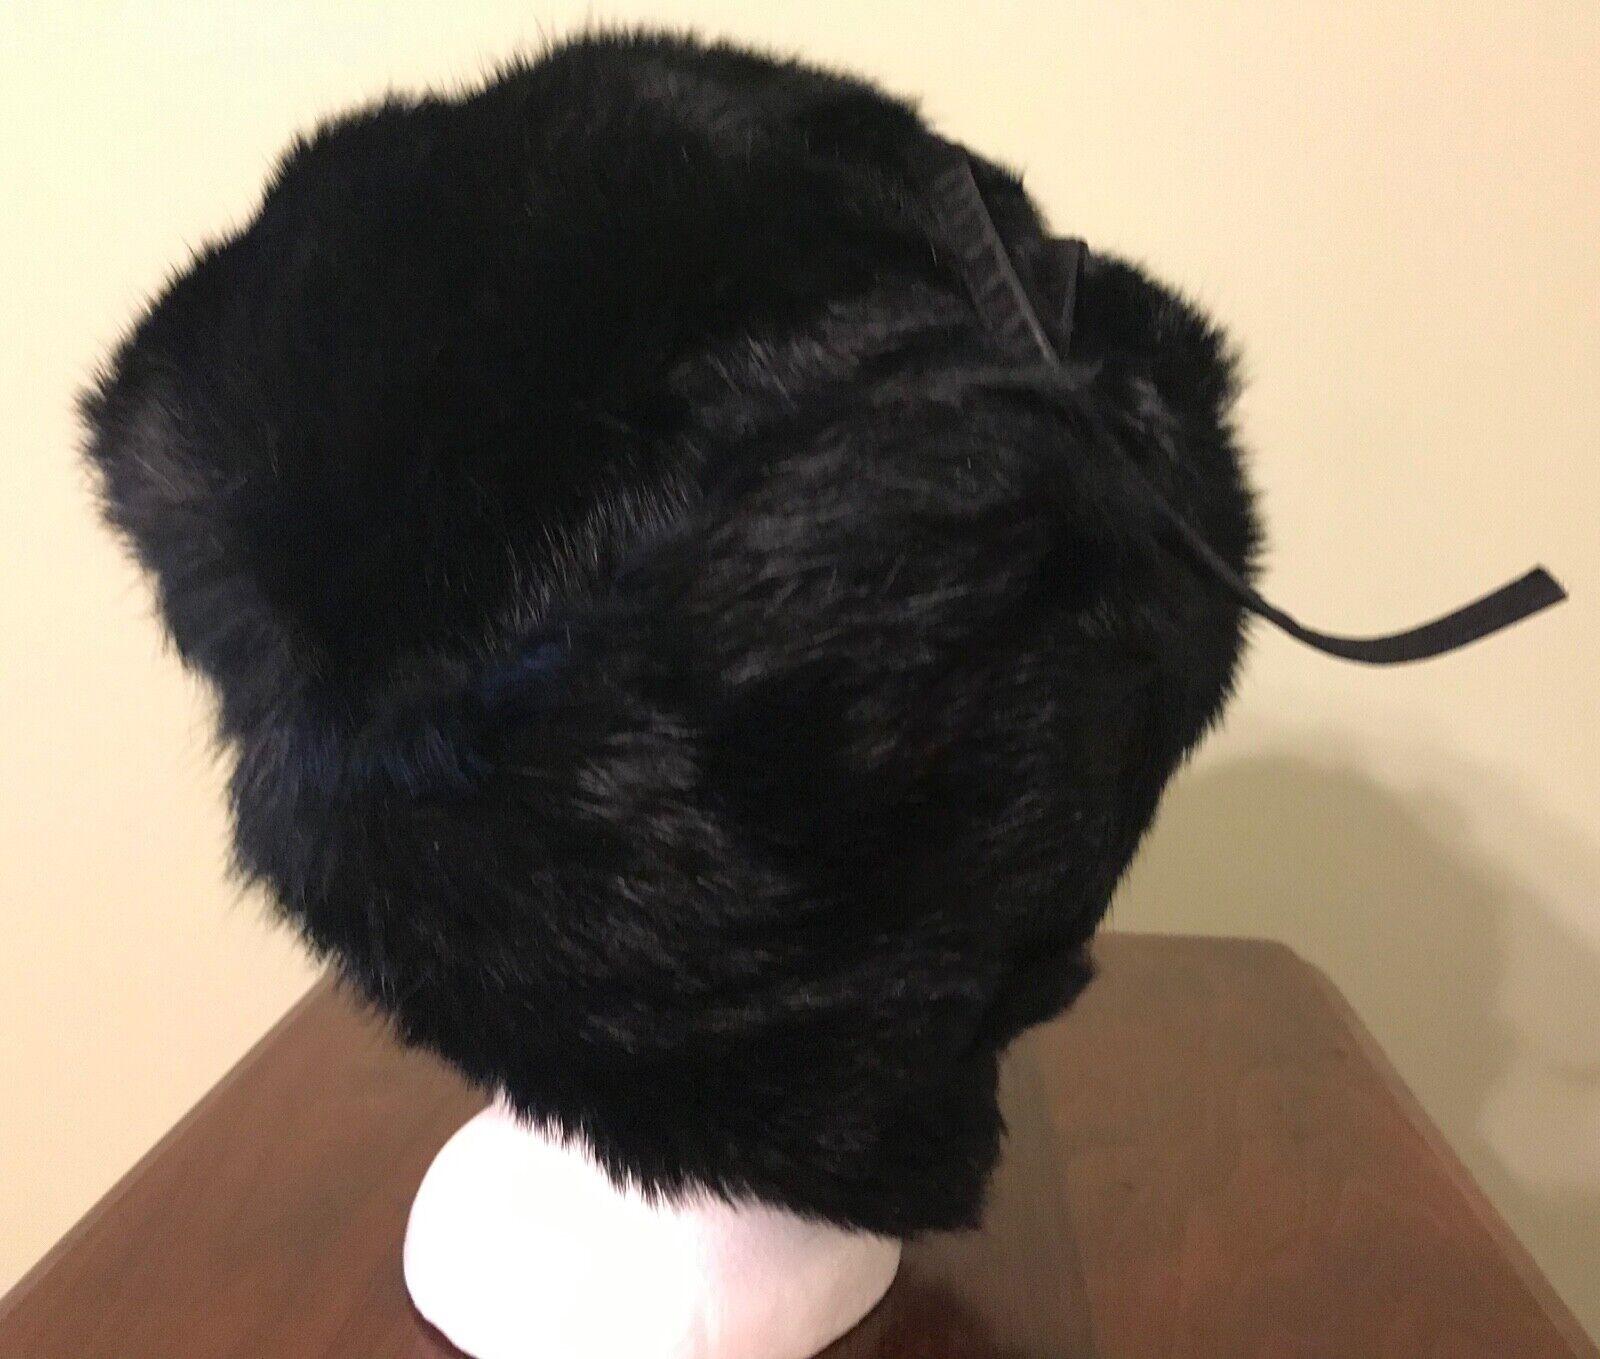 Vintage Black Mink Ladies' Hat with Flap Ear Muffs - image 2